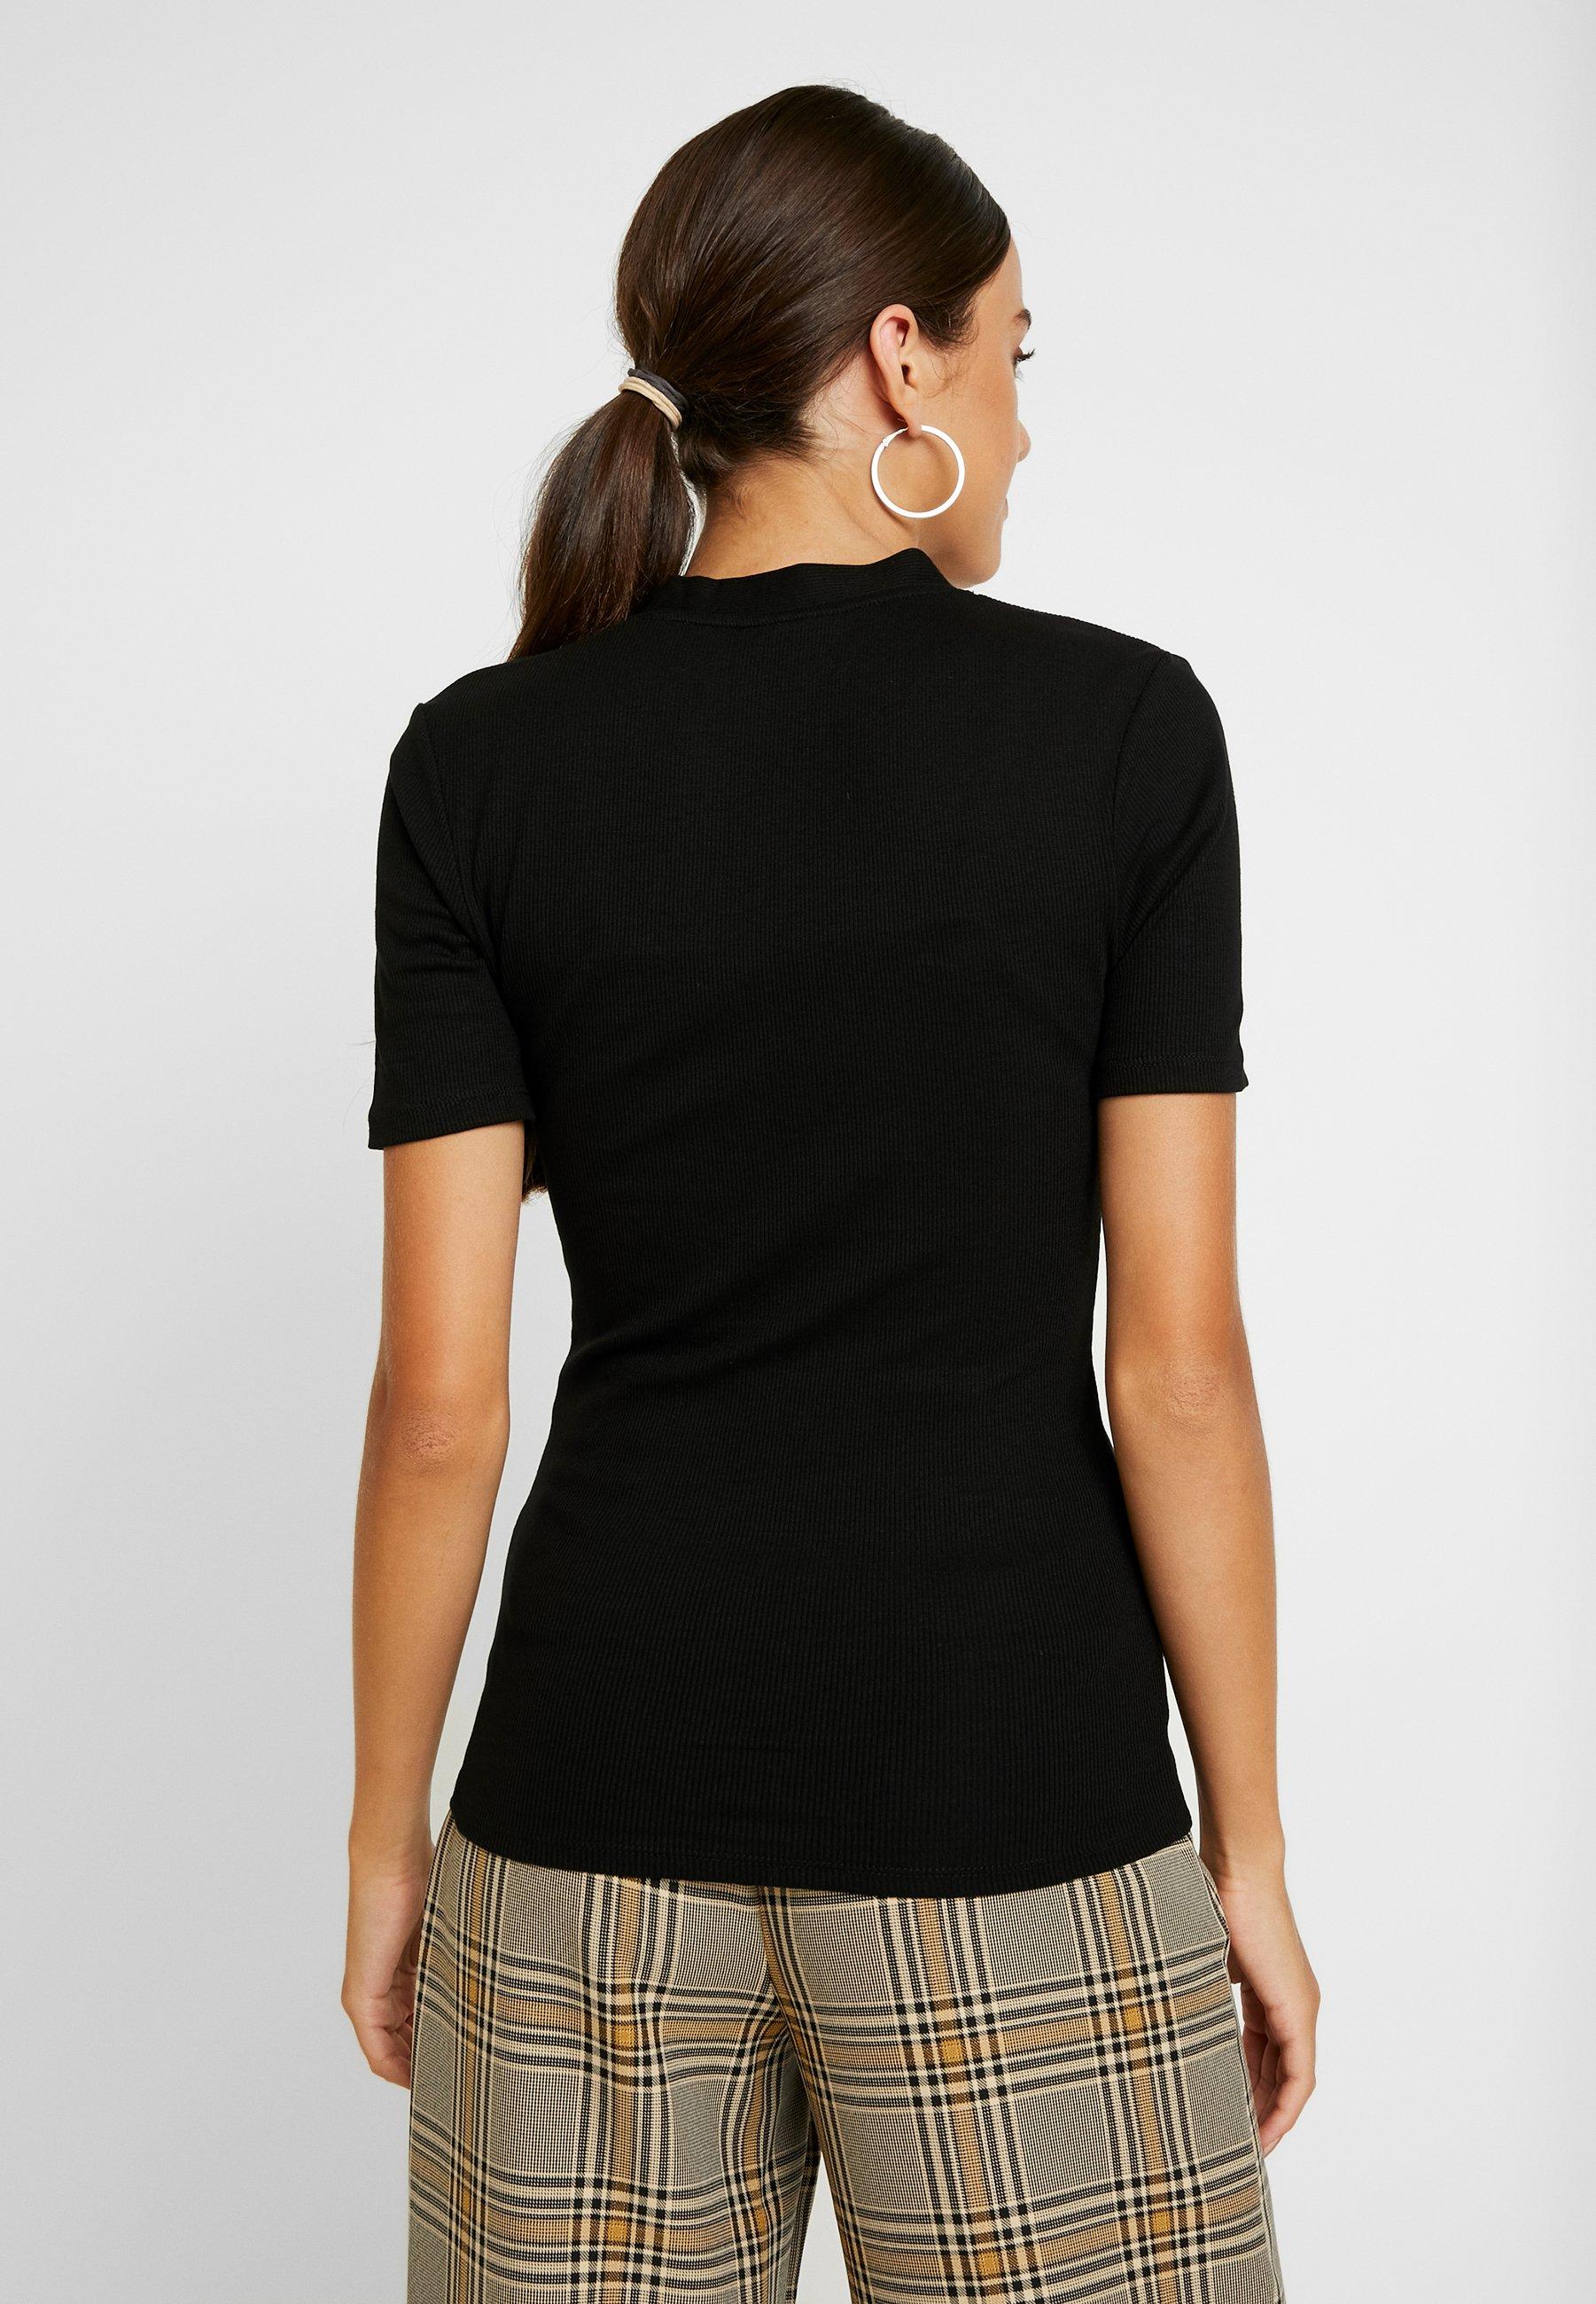 Object ObjellieT Imprimé shirt Imprimé Black ObjellieT Object ObjellieT shirt Imprimé shirt Object Black vNw8Om0n